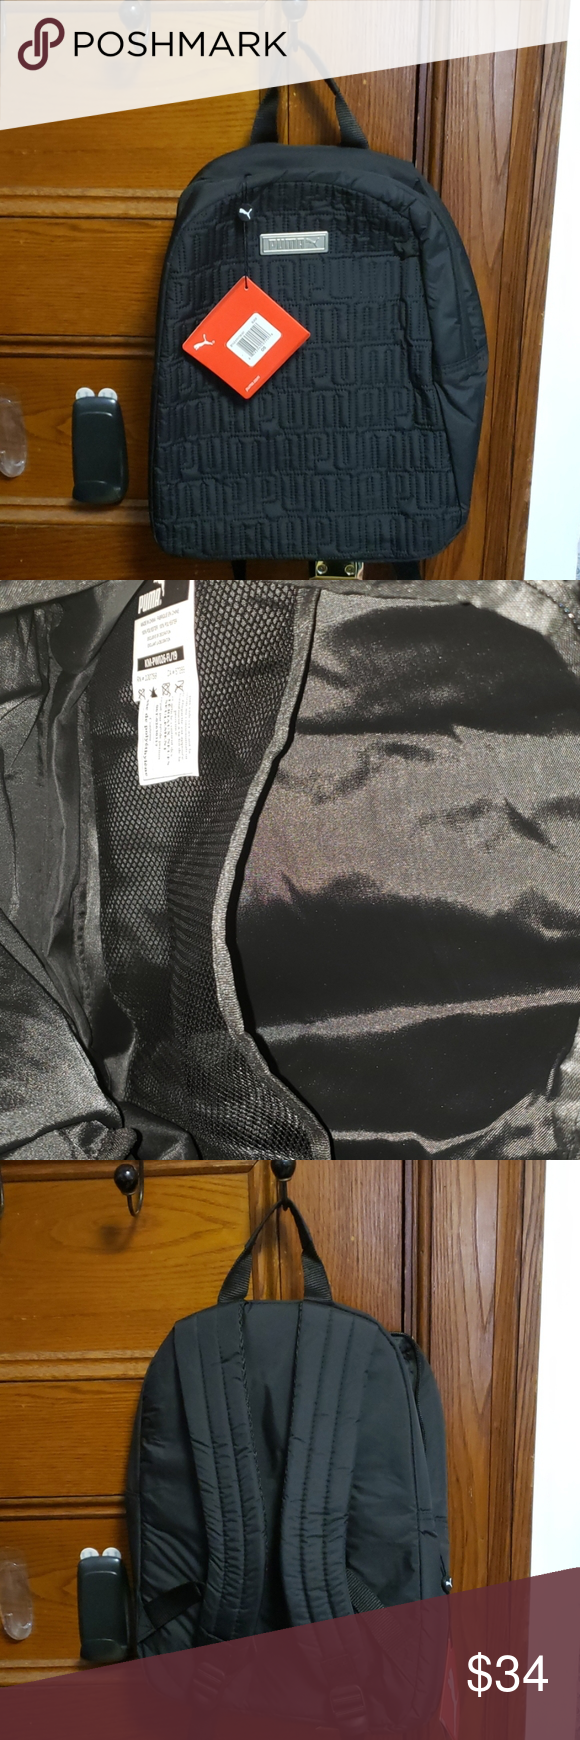 Temporada Dólar Moda  Nwt Puma Alpha mini Backpack in 2020   Backpack brands, Clothes design,  Fashion boutique